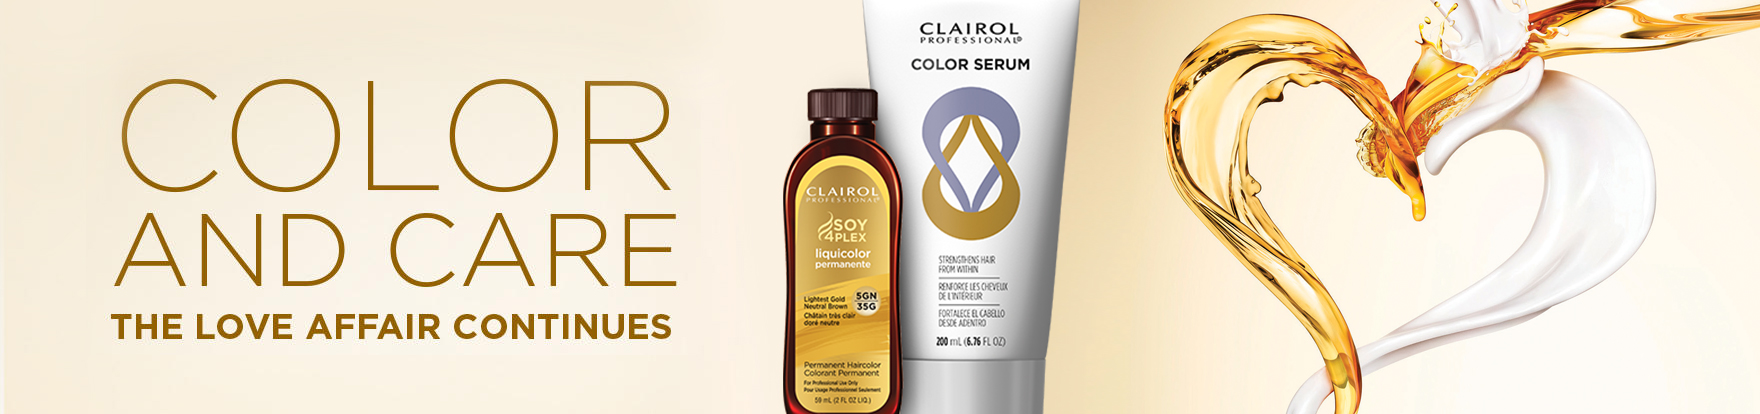 Clairol Color Serum